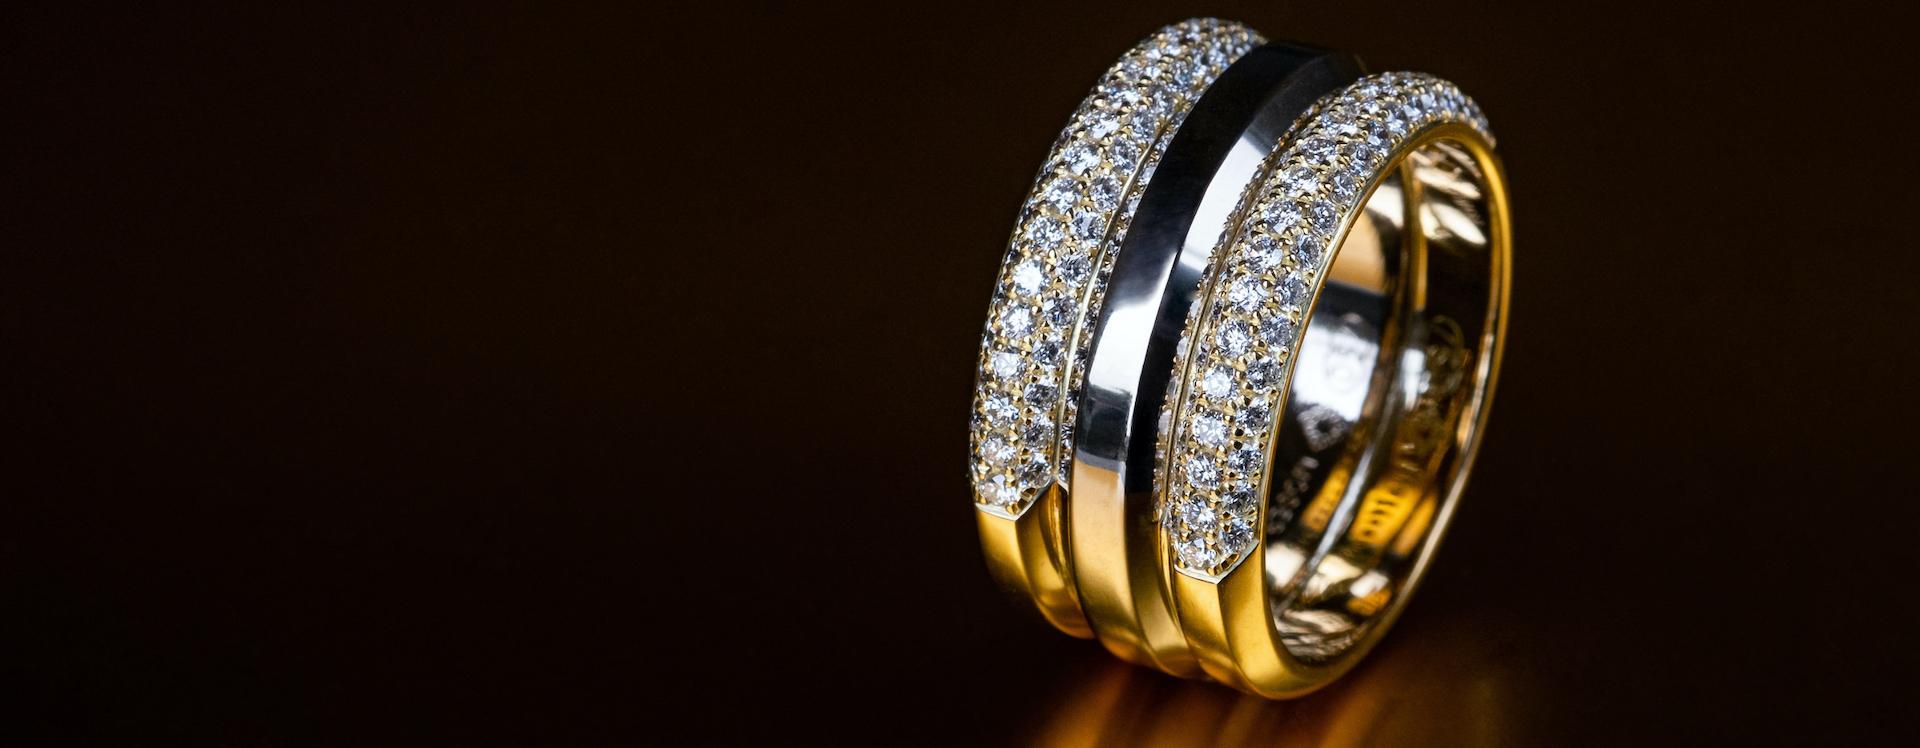 Diamond wedding rings adelaide jeweller